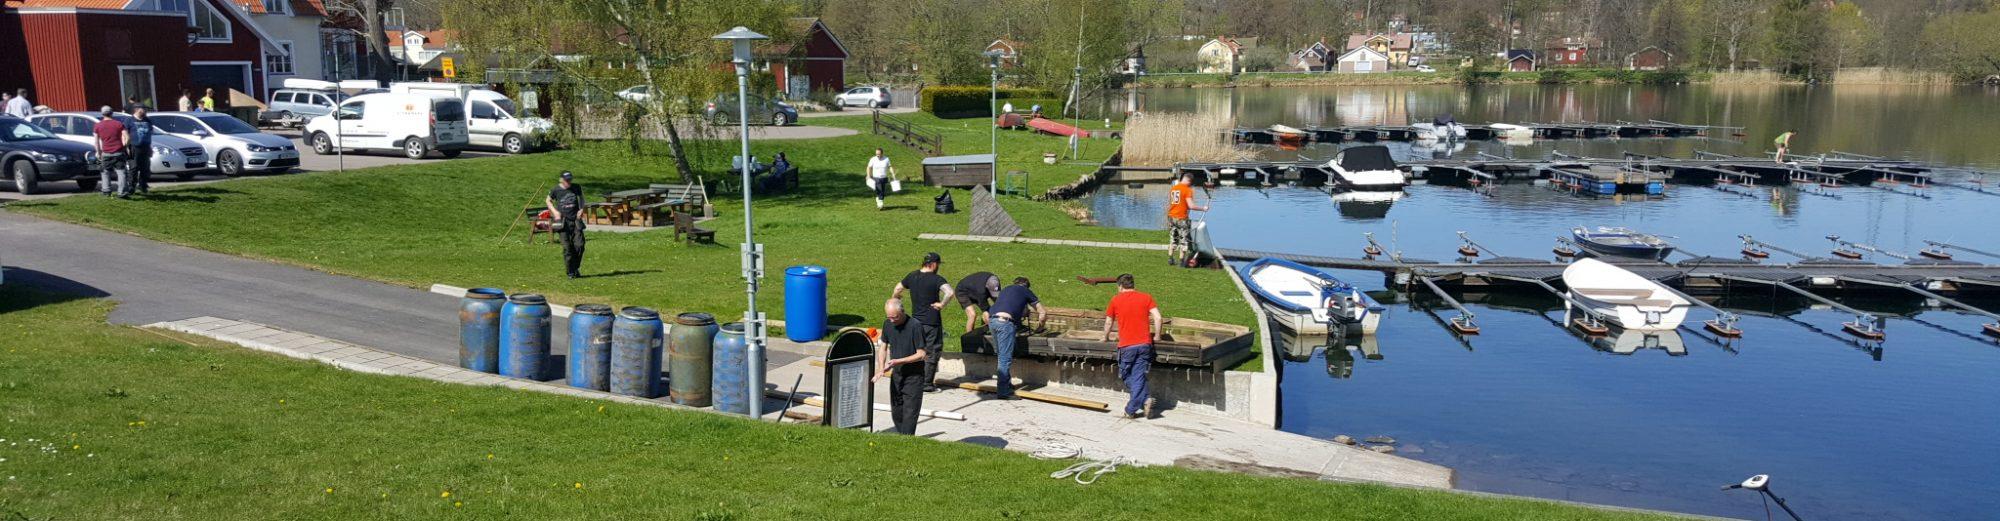 HBIF – Hårstorpssjöns Båt- & Intresseförening, Motala